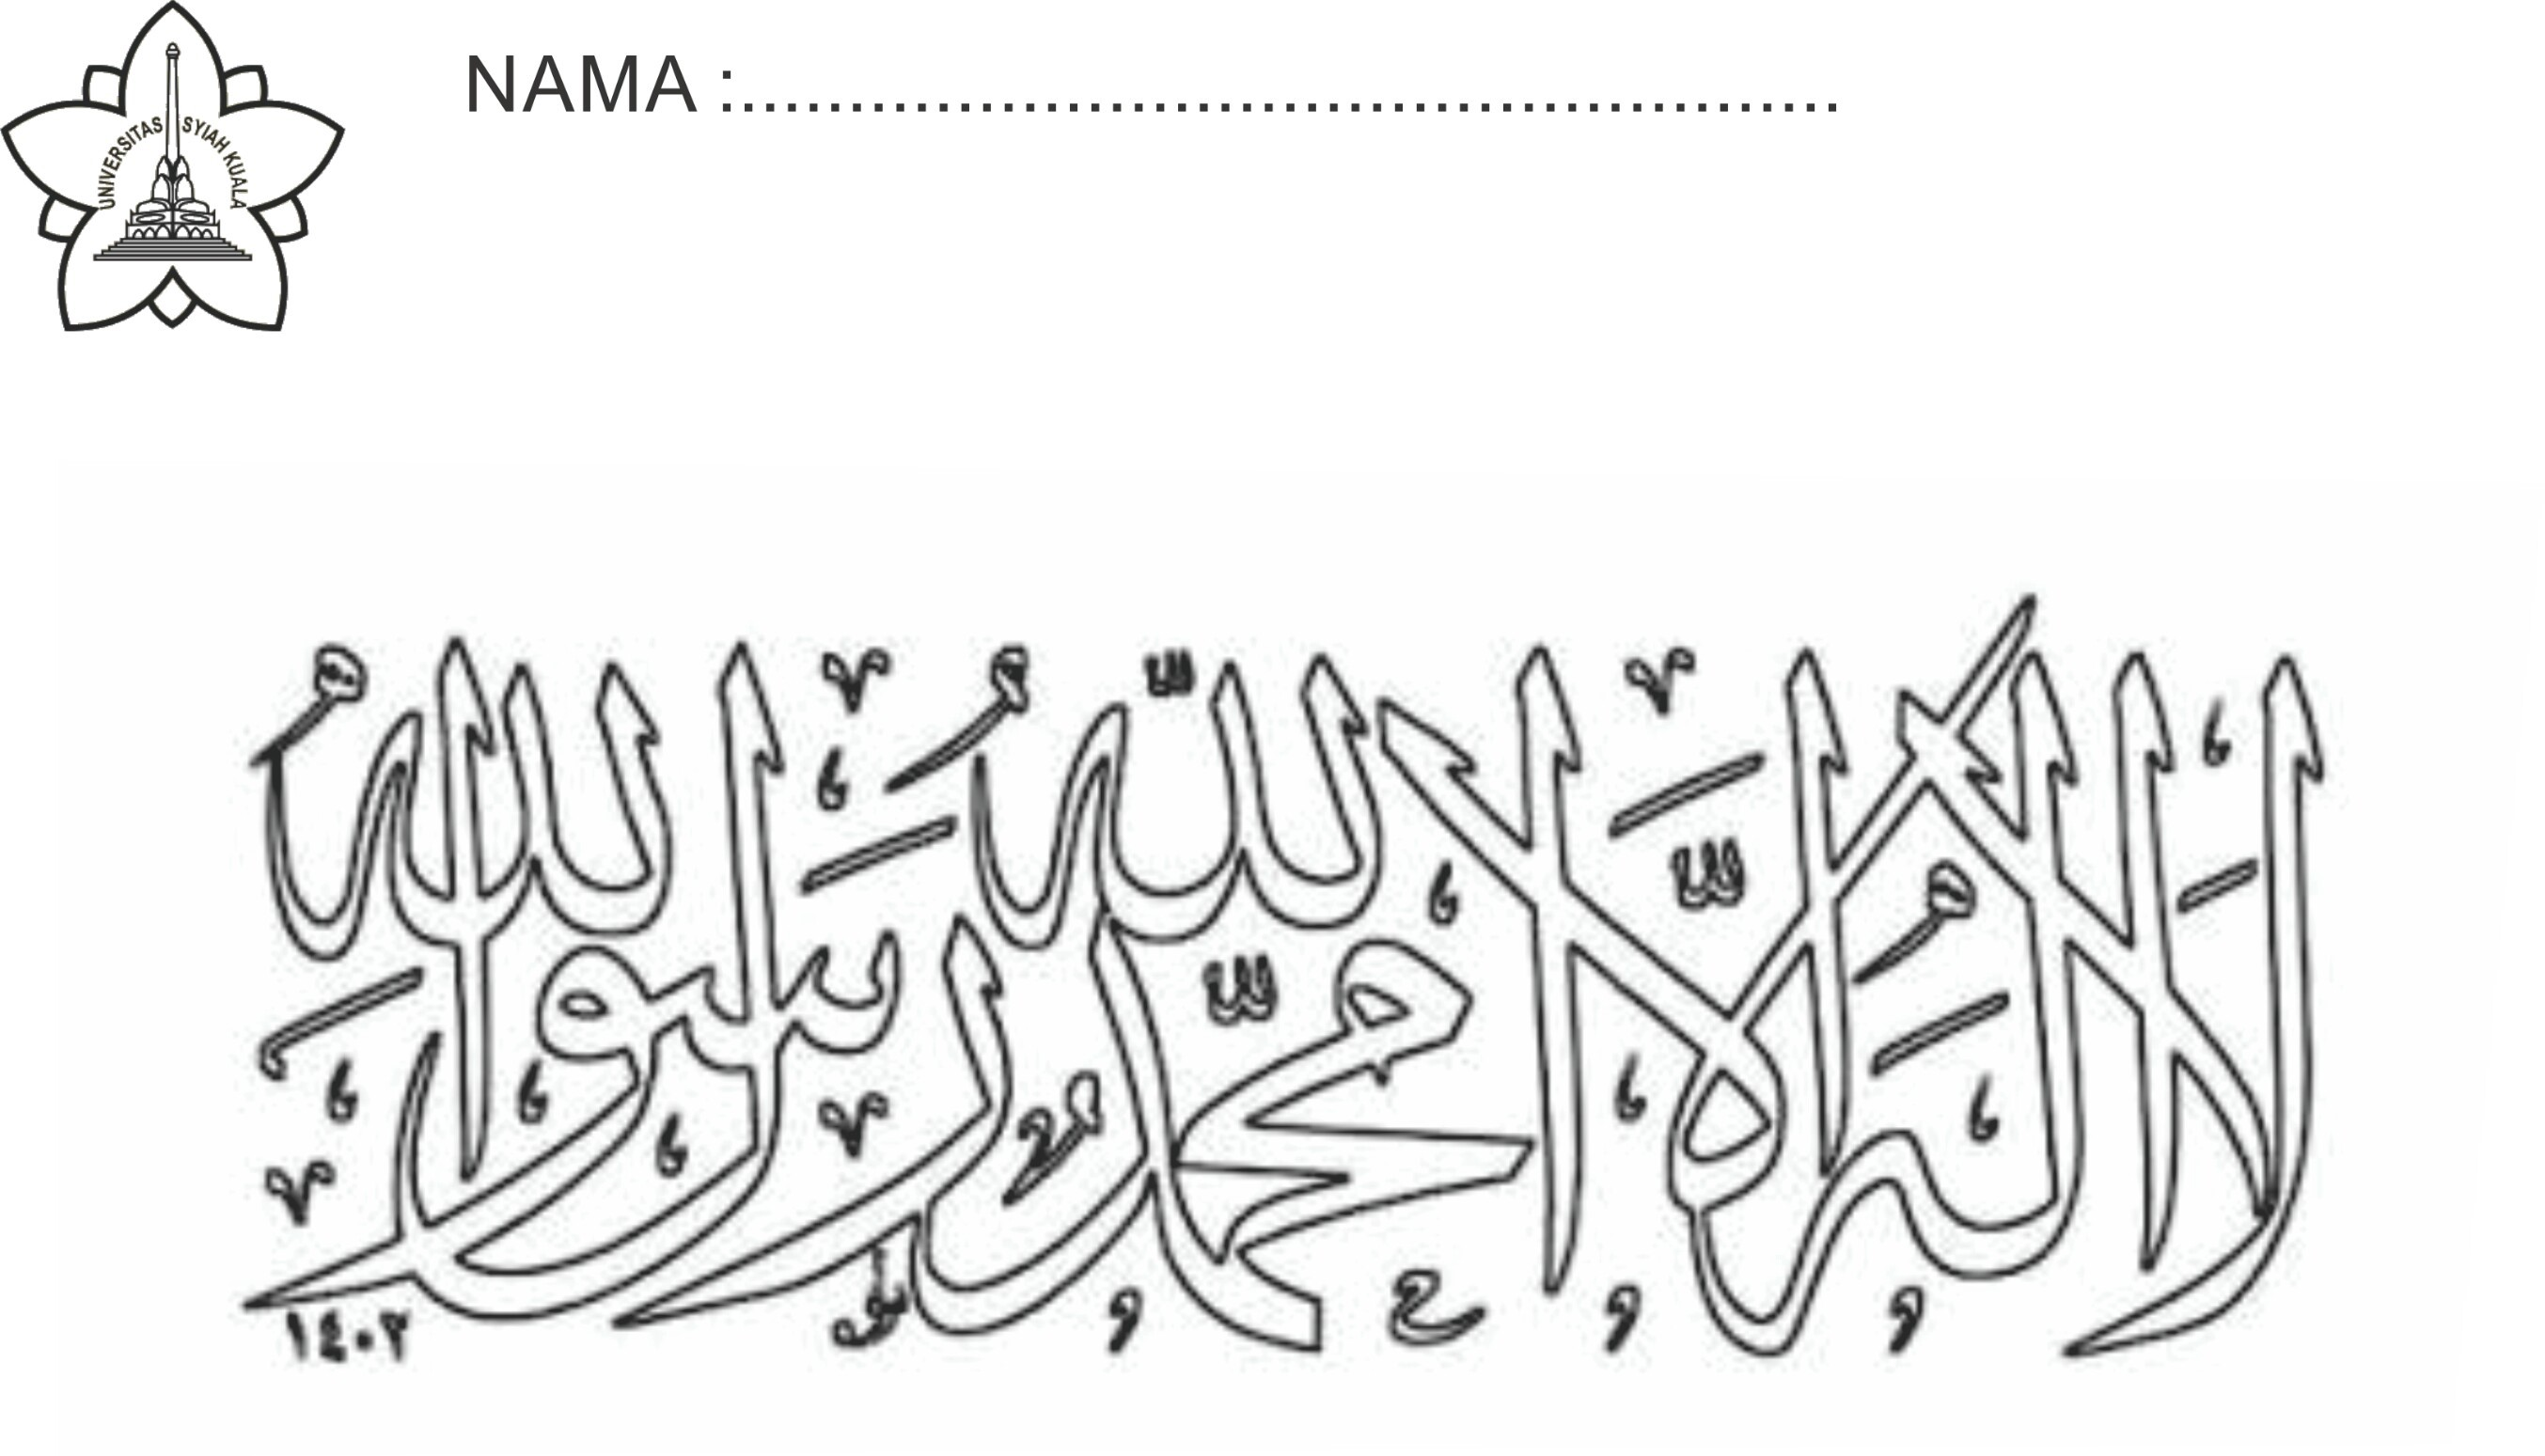 lomba kaligrafi 0026 lomba kaligrafi 0027 lomba kaligrafi 0028